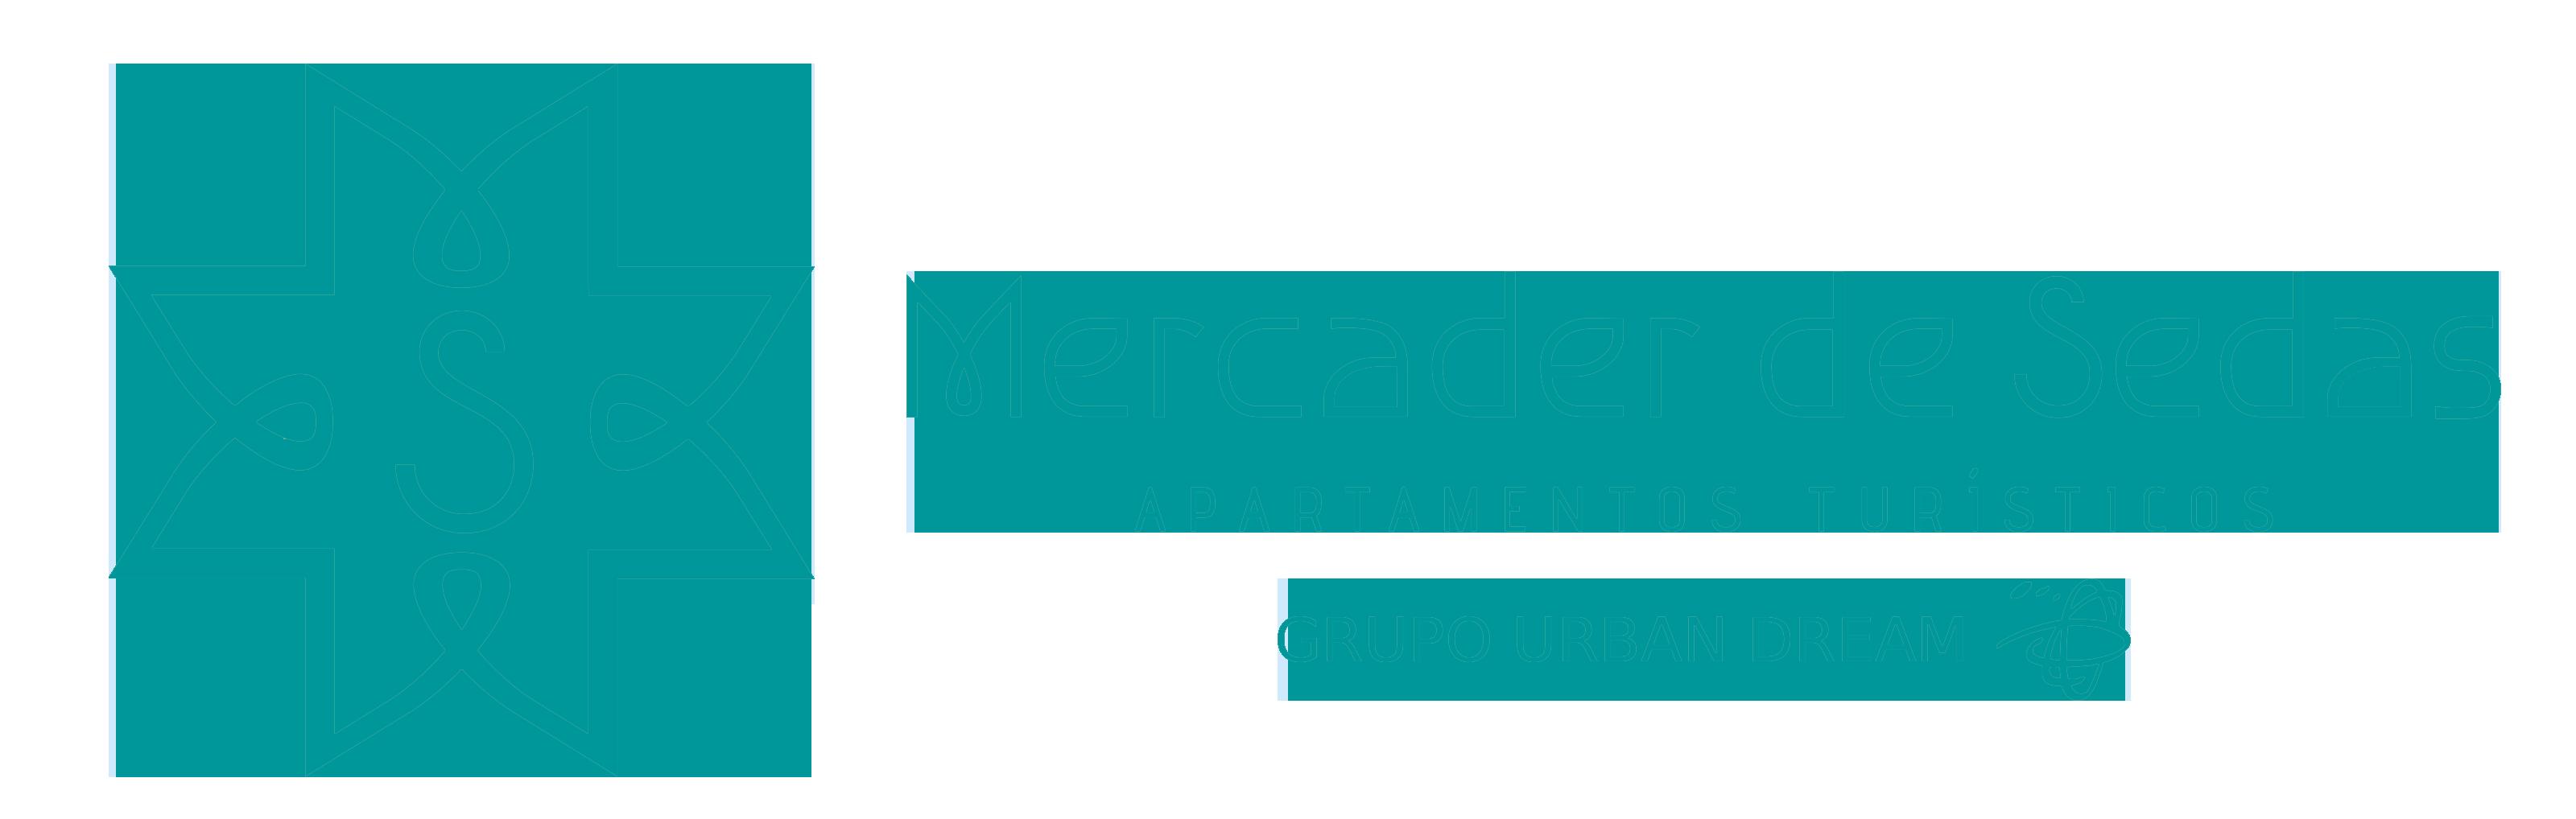 Apartamentos Mercader de Sedas